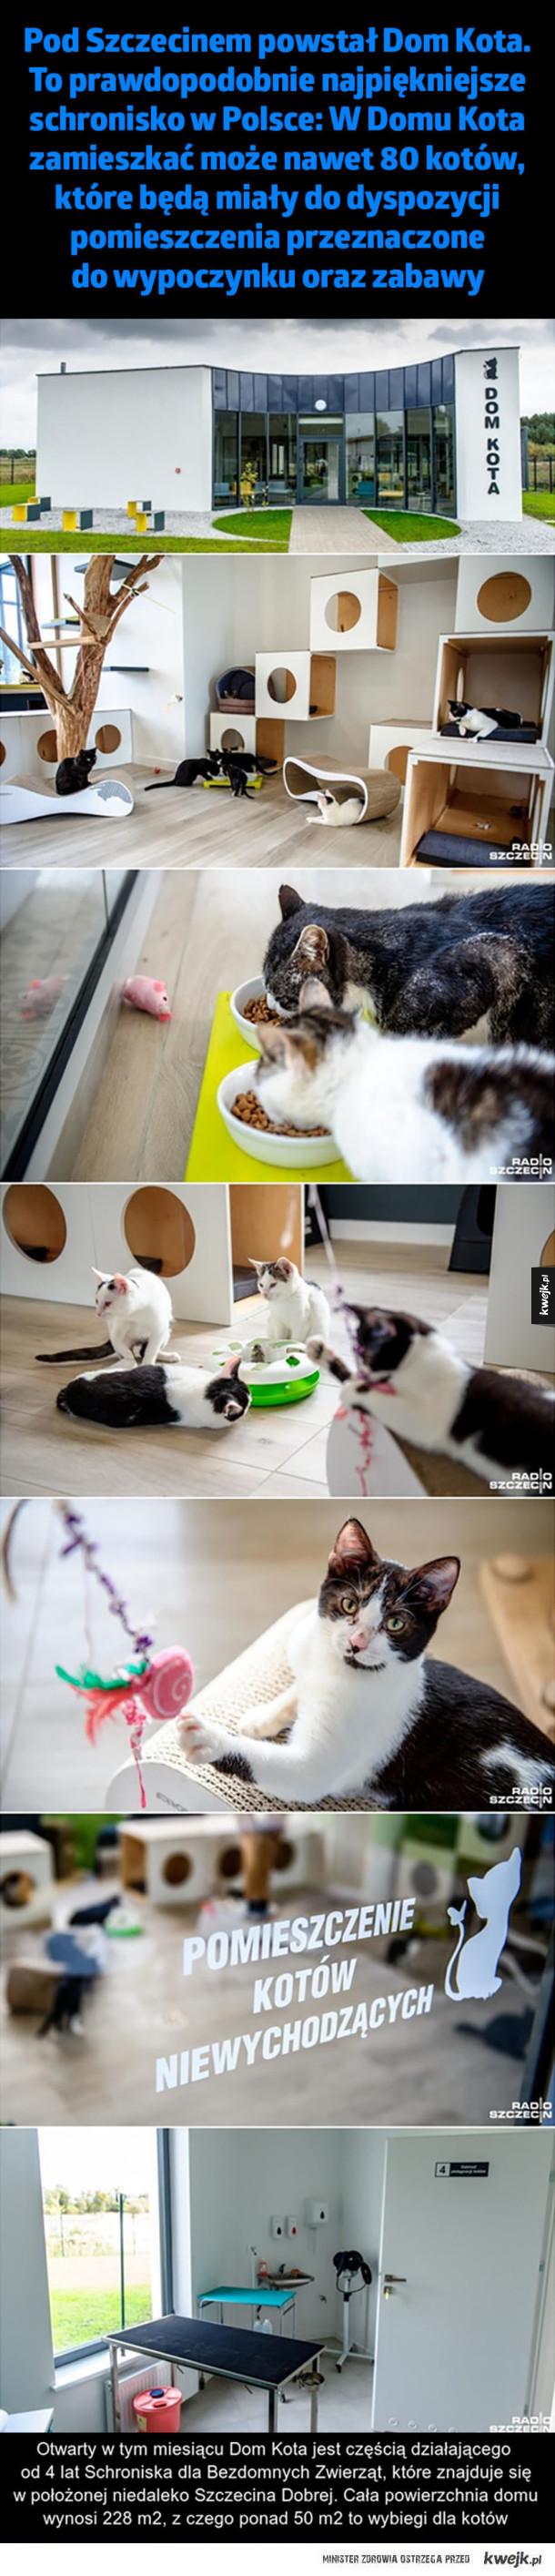 Dom kota